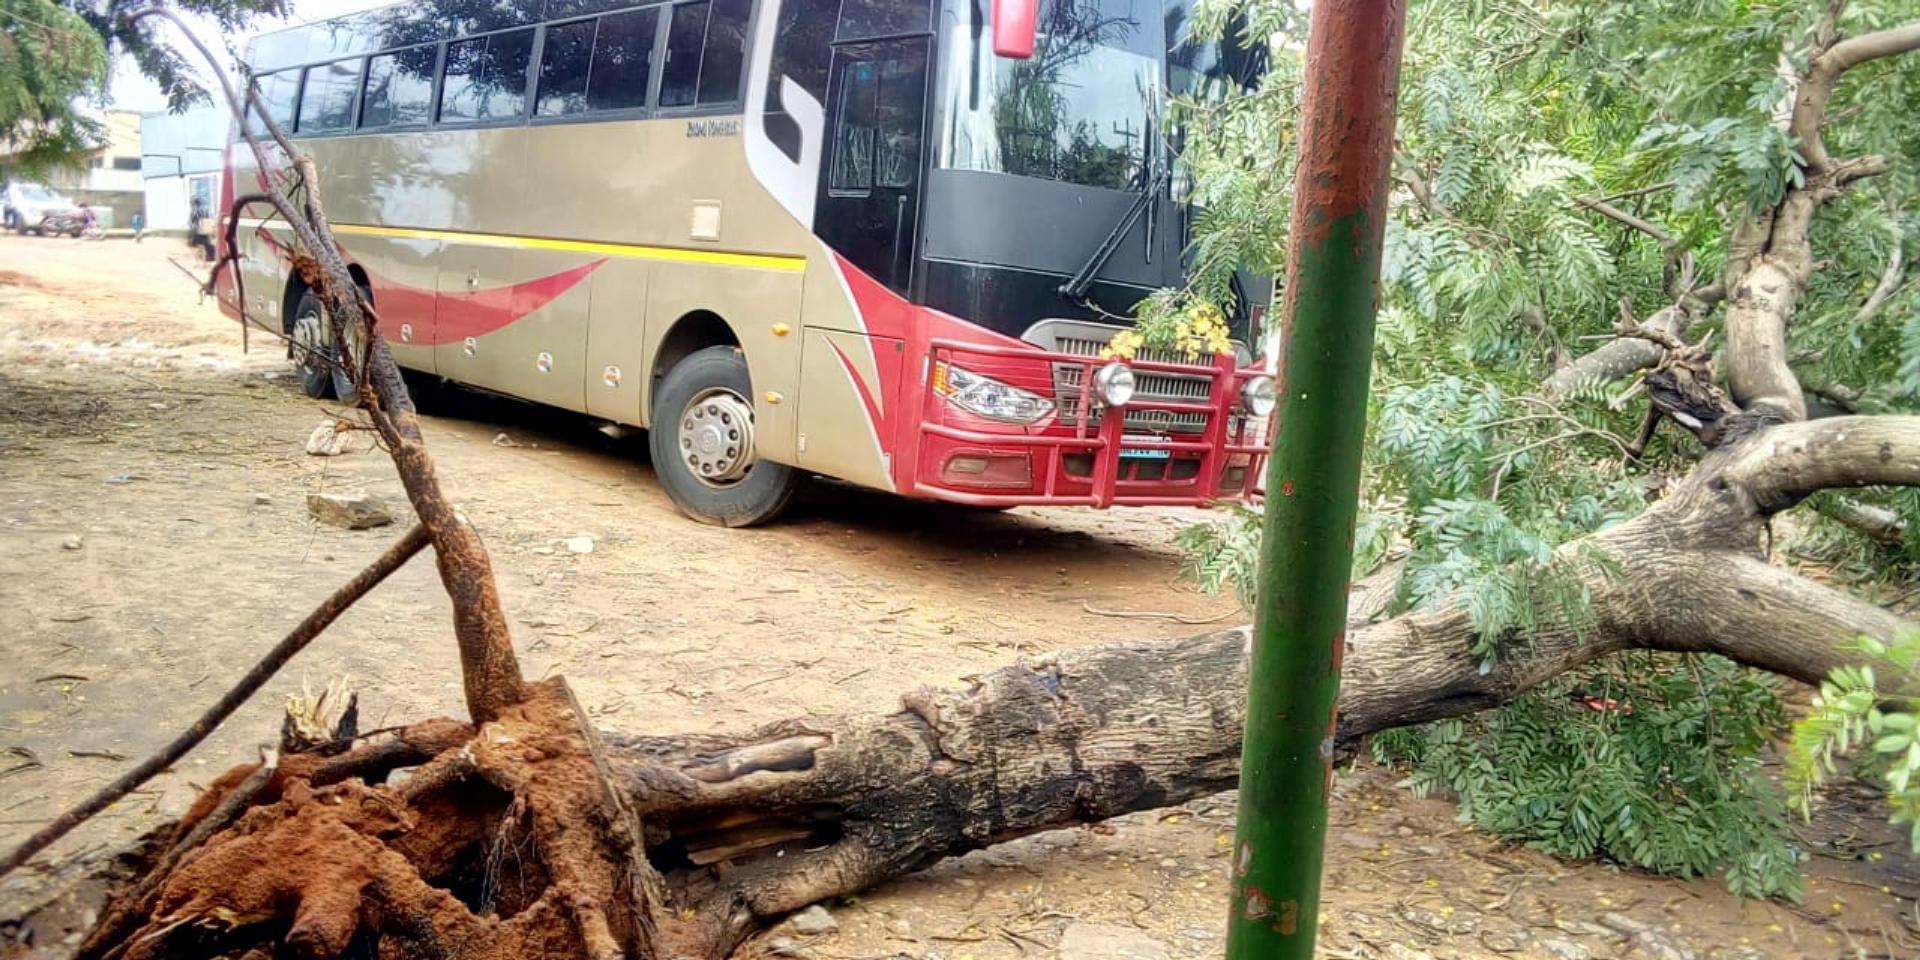 Newsdeck: Cyclone Death Toll Climbs; Comoros Struggles to Restore Power